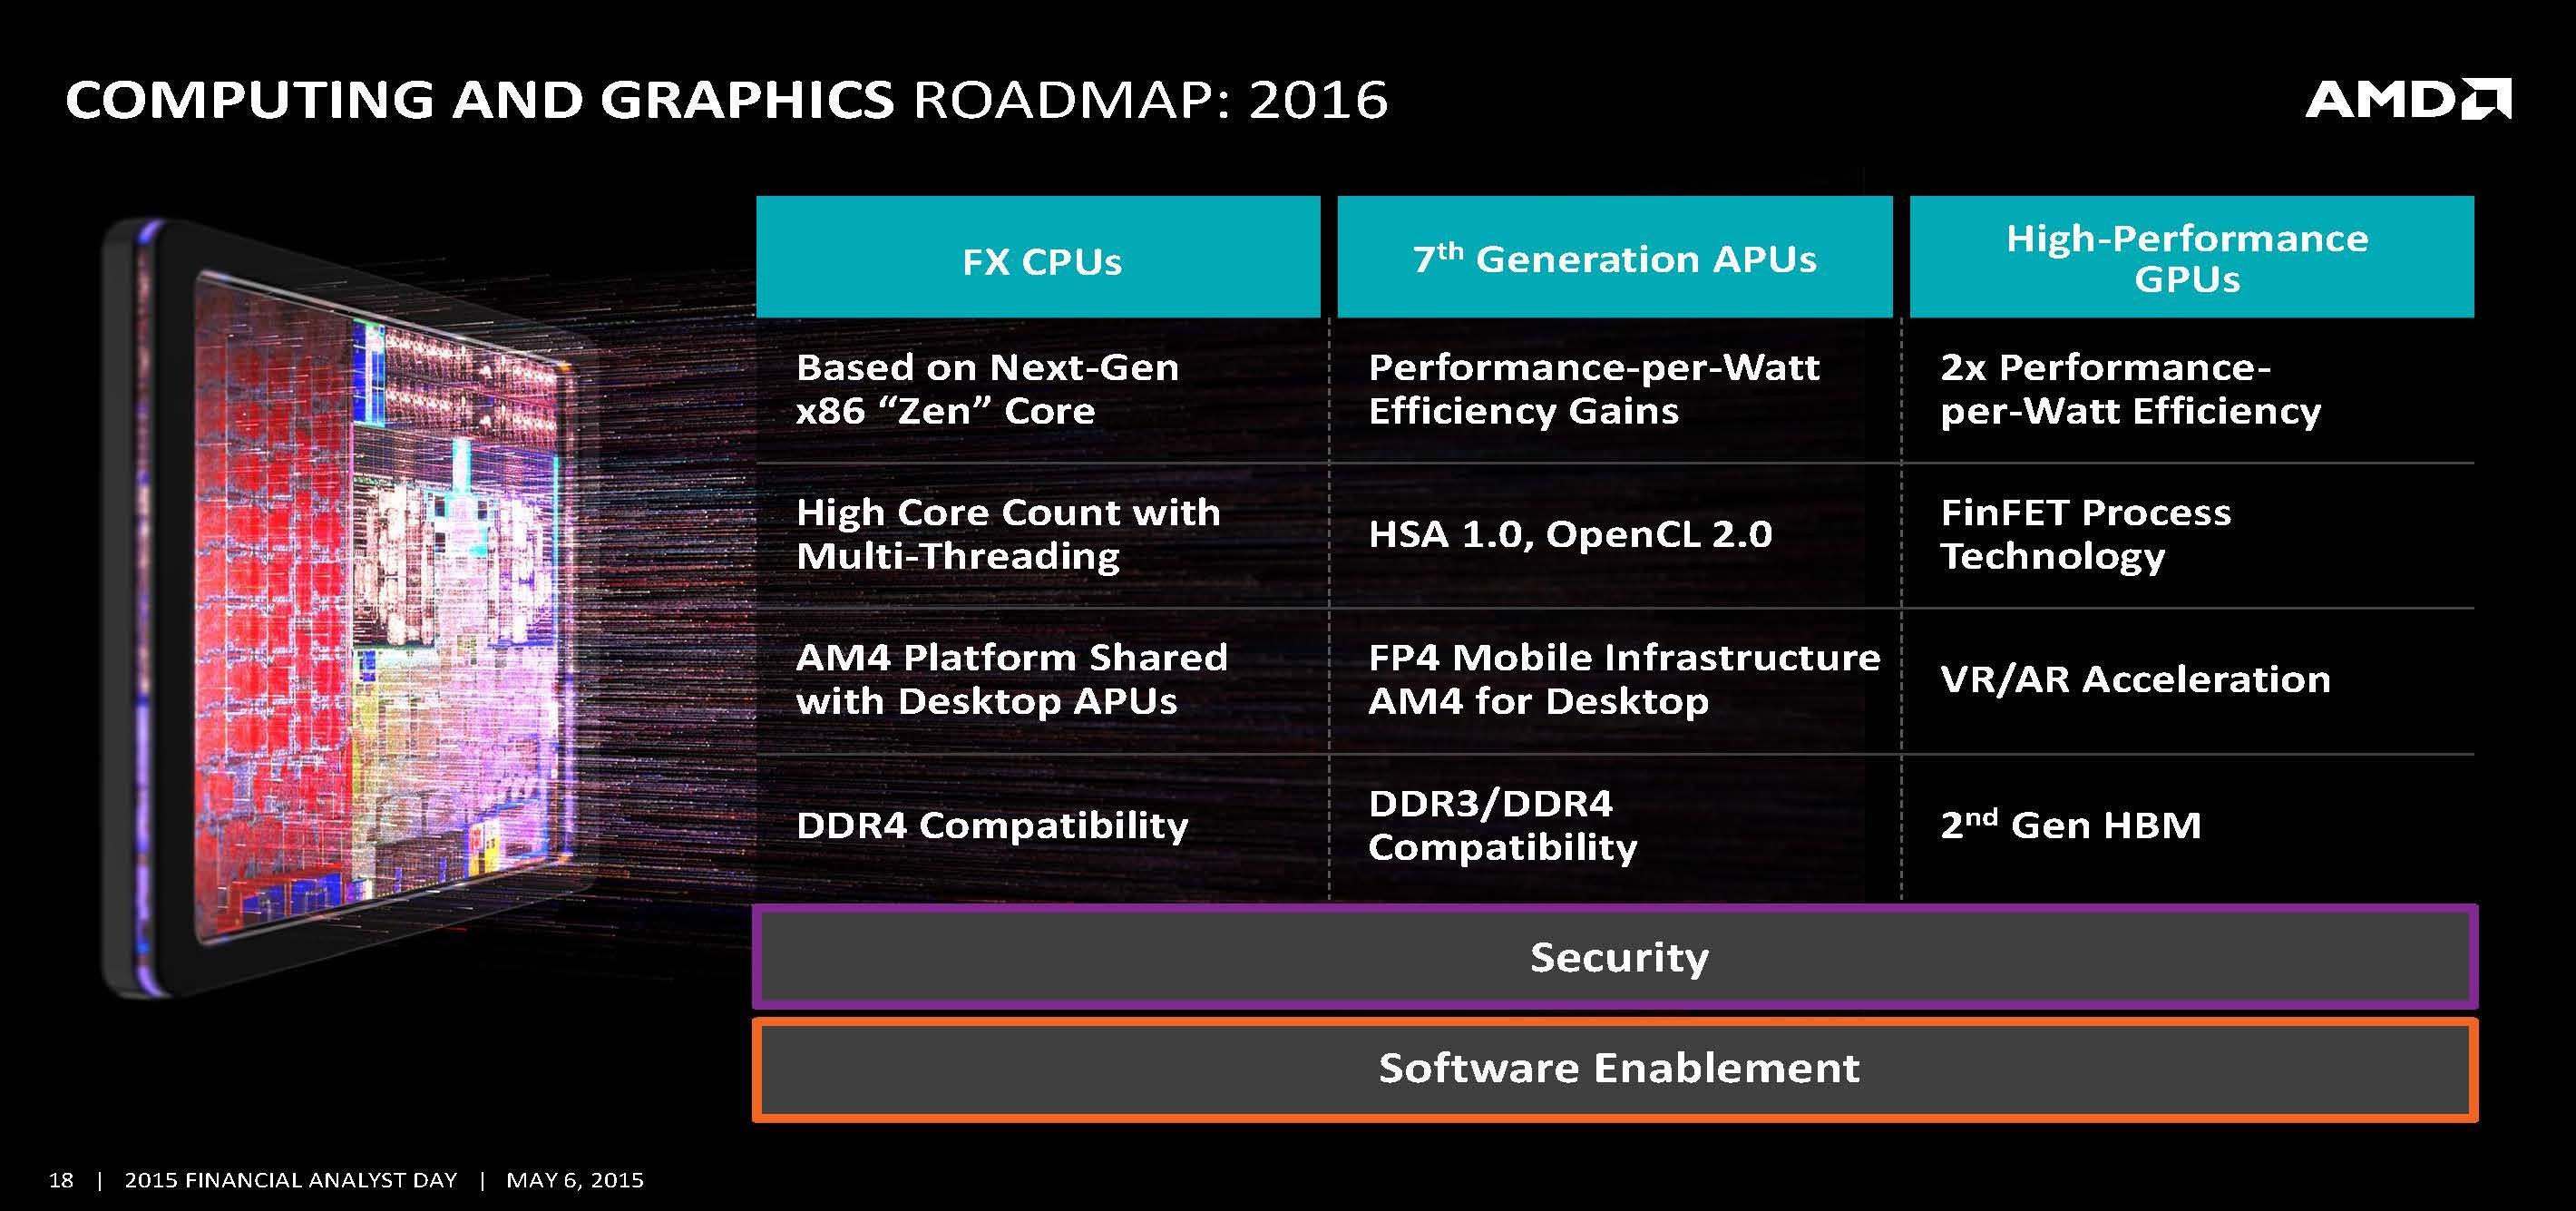 http://www.custompcreview.com/wp-content/uploads/2015/05/amd-complete-lineup-roadmap-cpu-gpu-amd-financial-analyst-day-2015-3.jpg